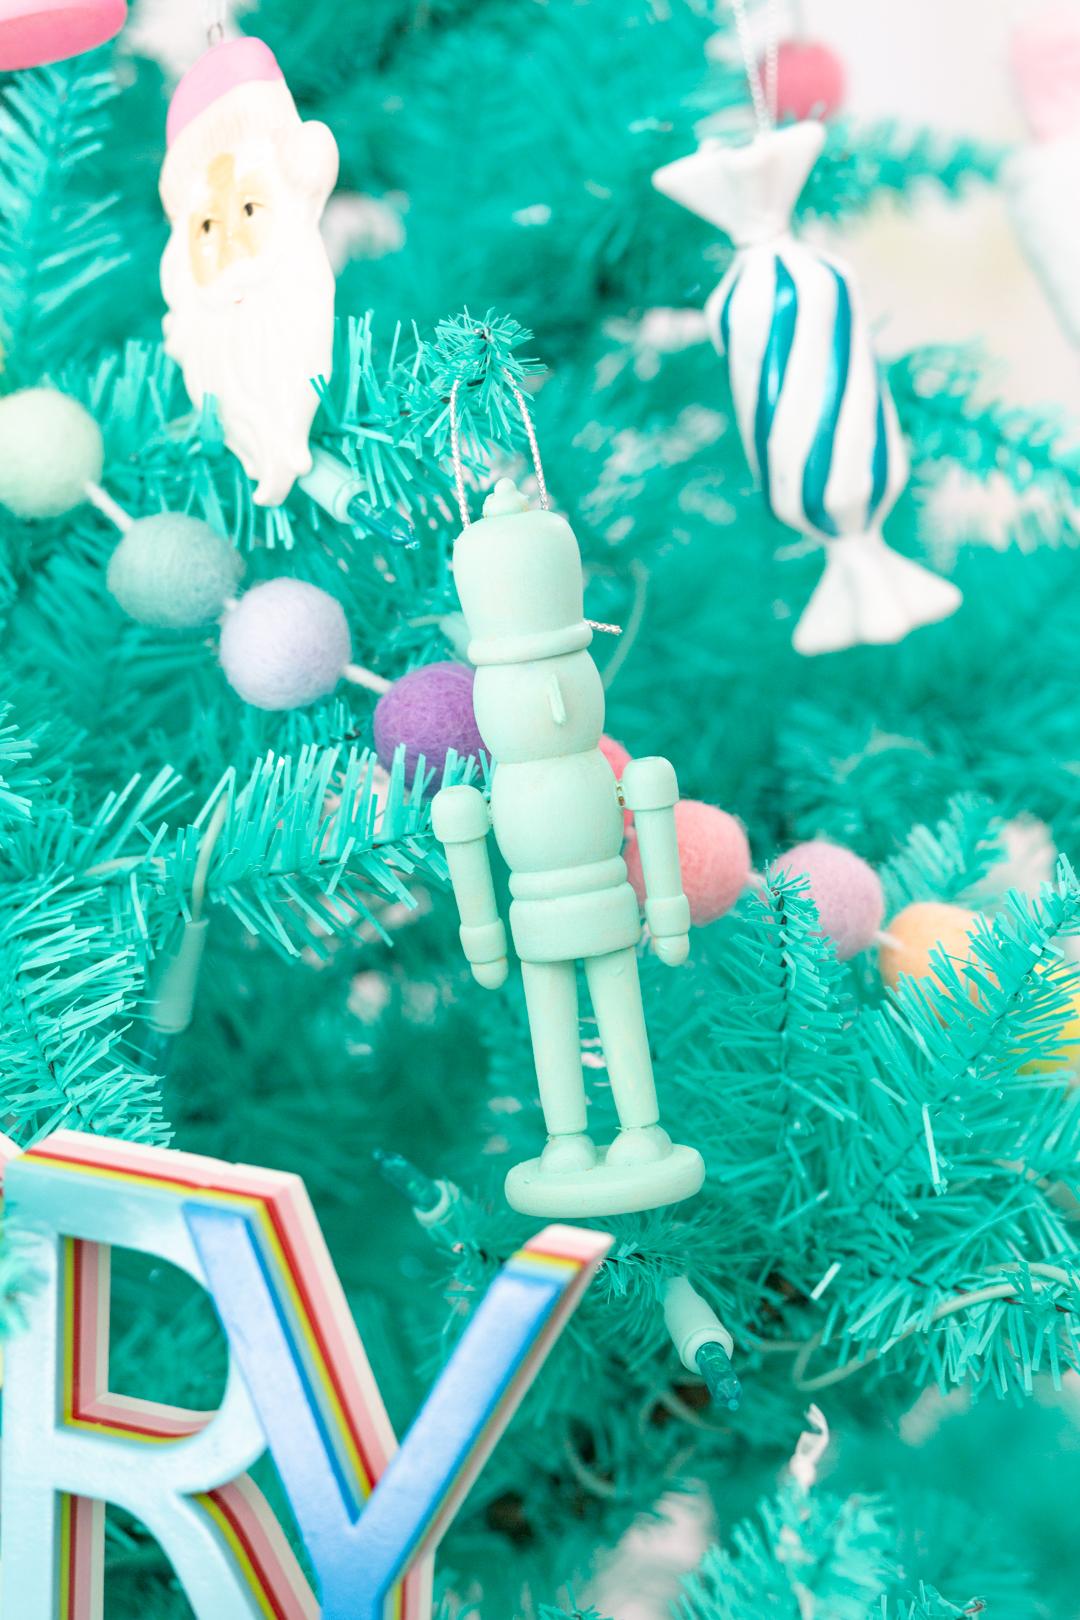 teal painted nutcracker ornament